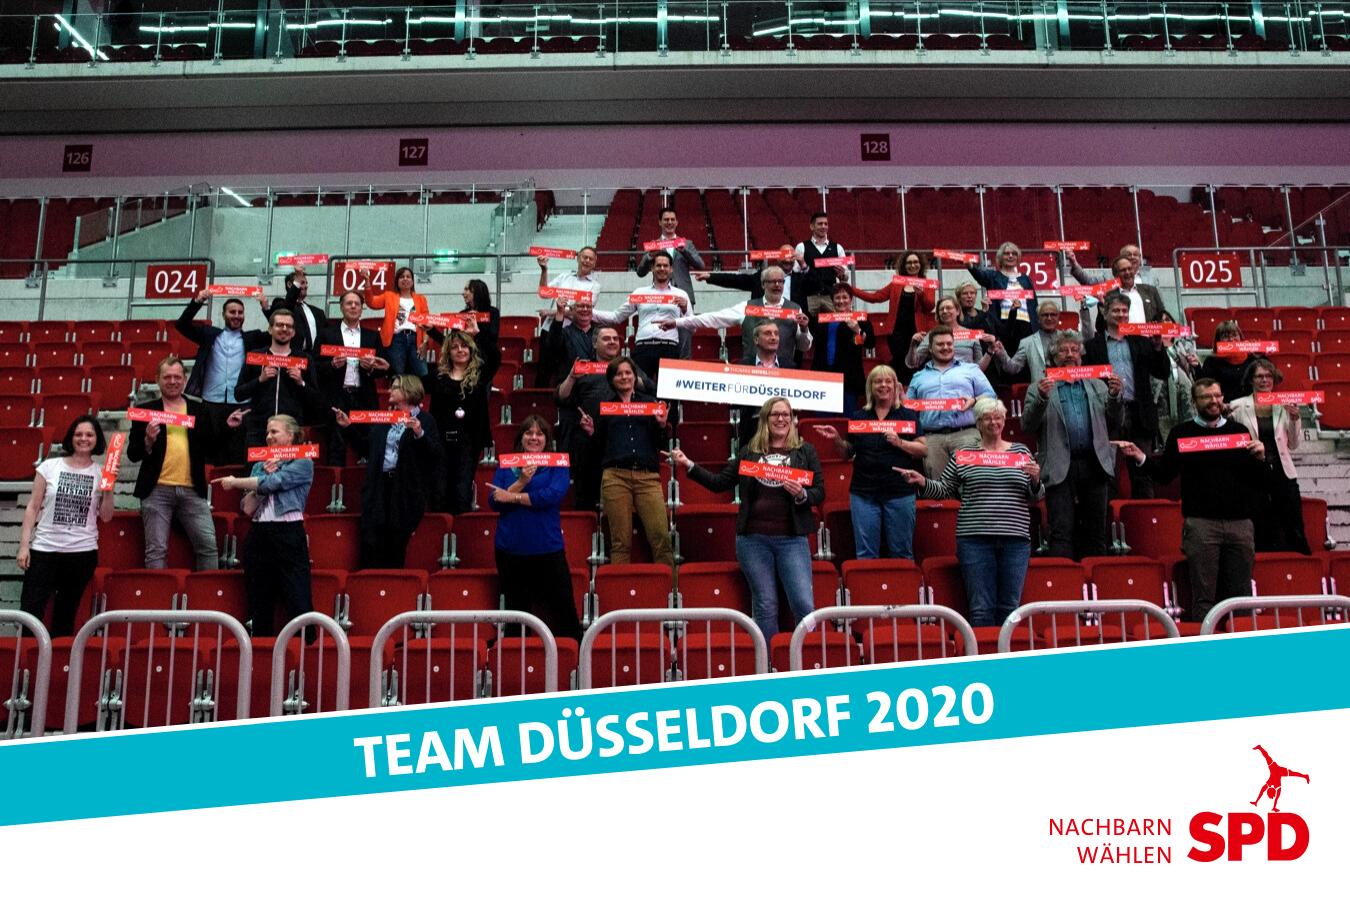 Team Düsseldorf 2020